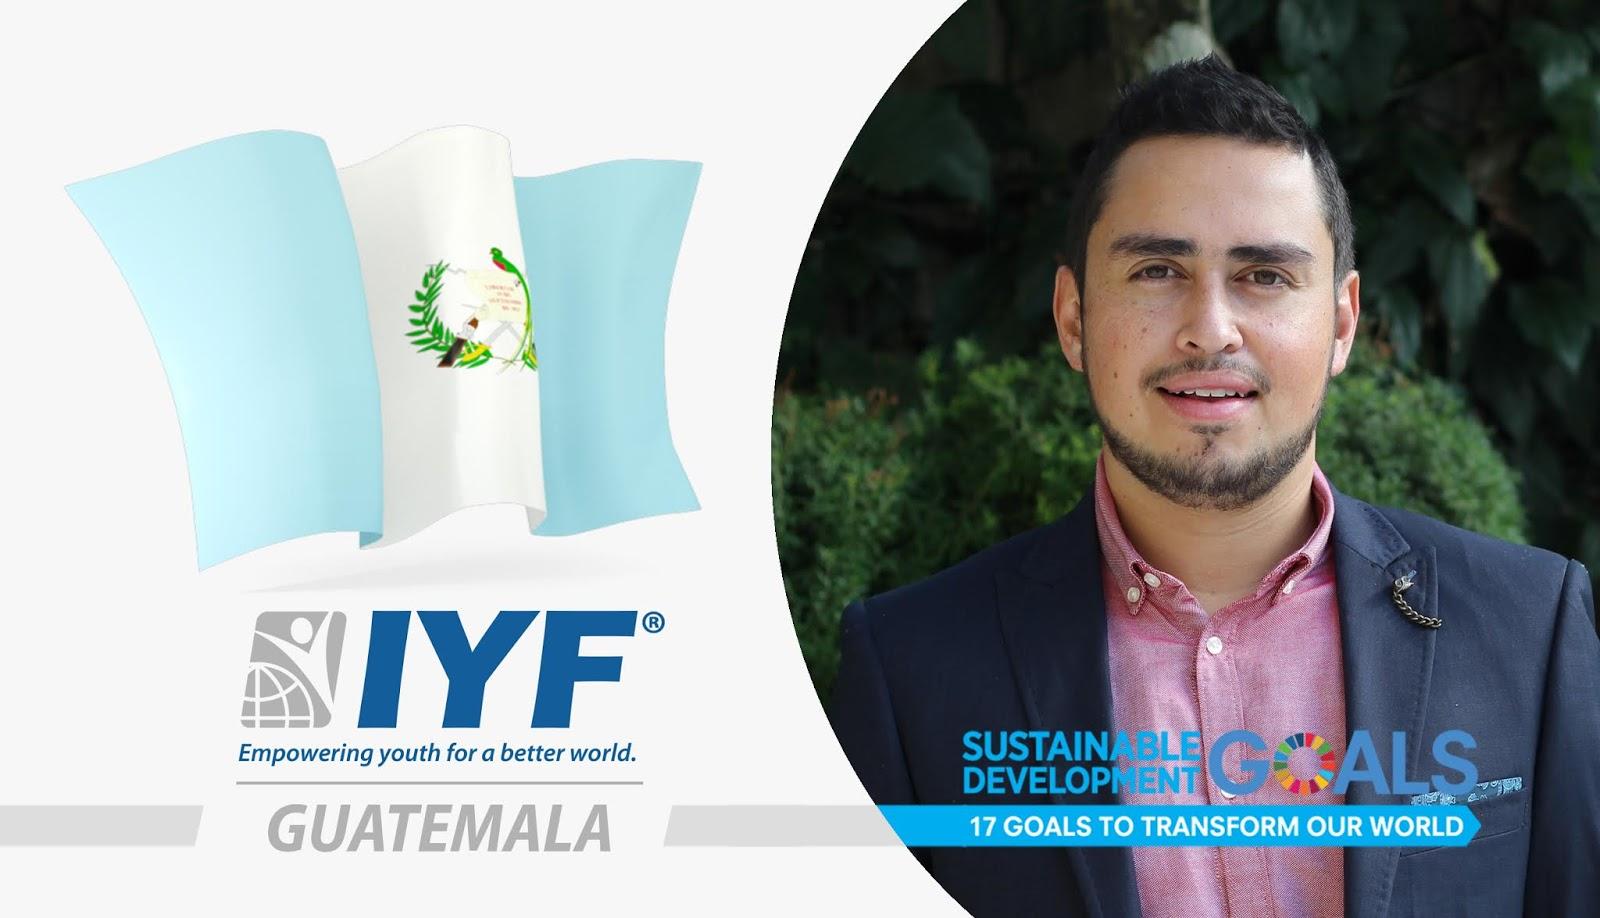 Juan Ramos, IYF Representative in Guatemala